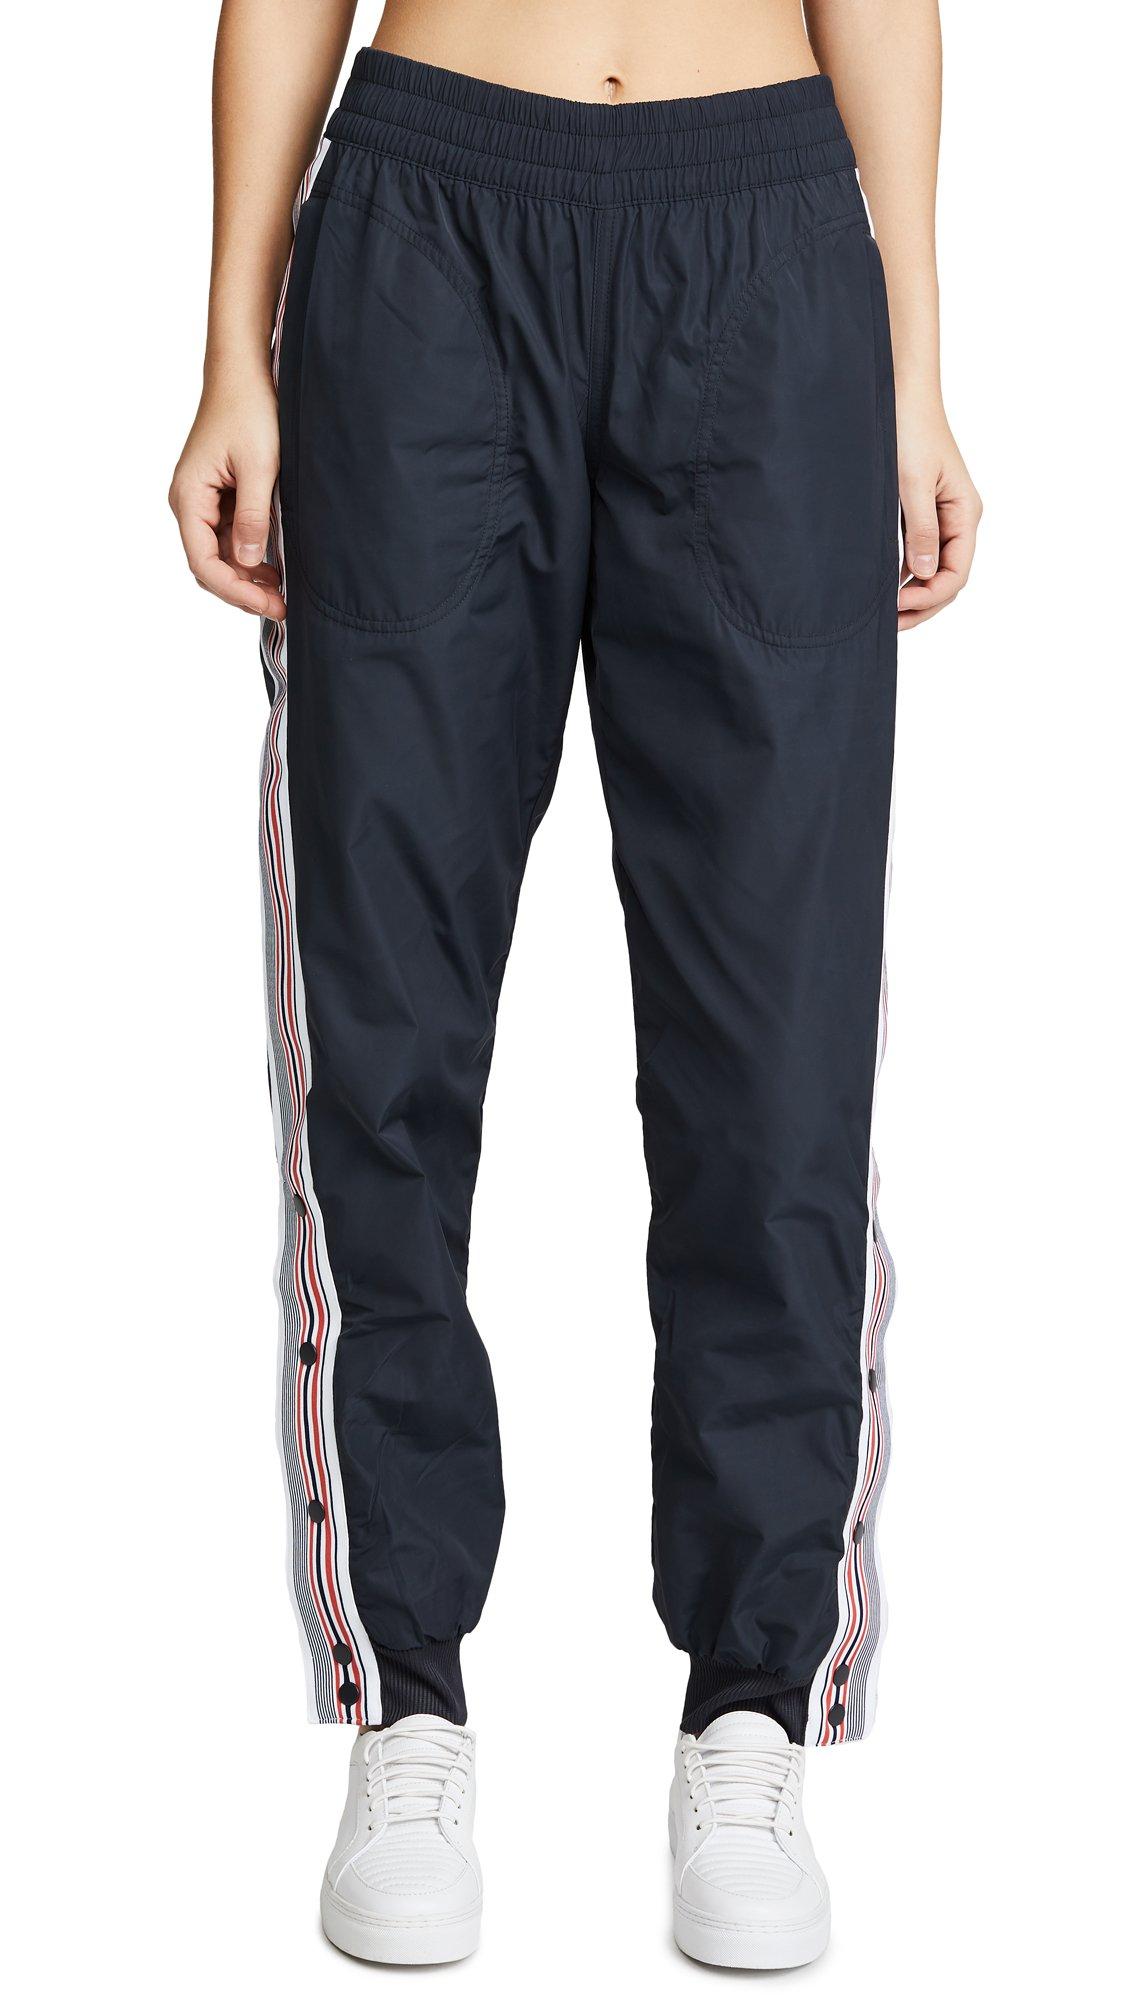 adidas Stella McCartney Women's Train Track Pants, Night Grey, Medium